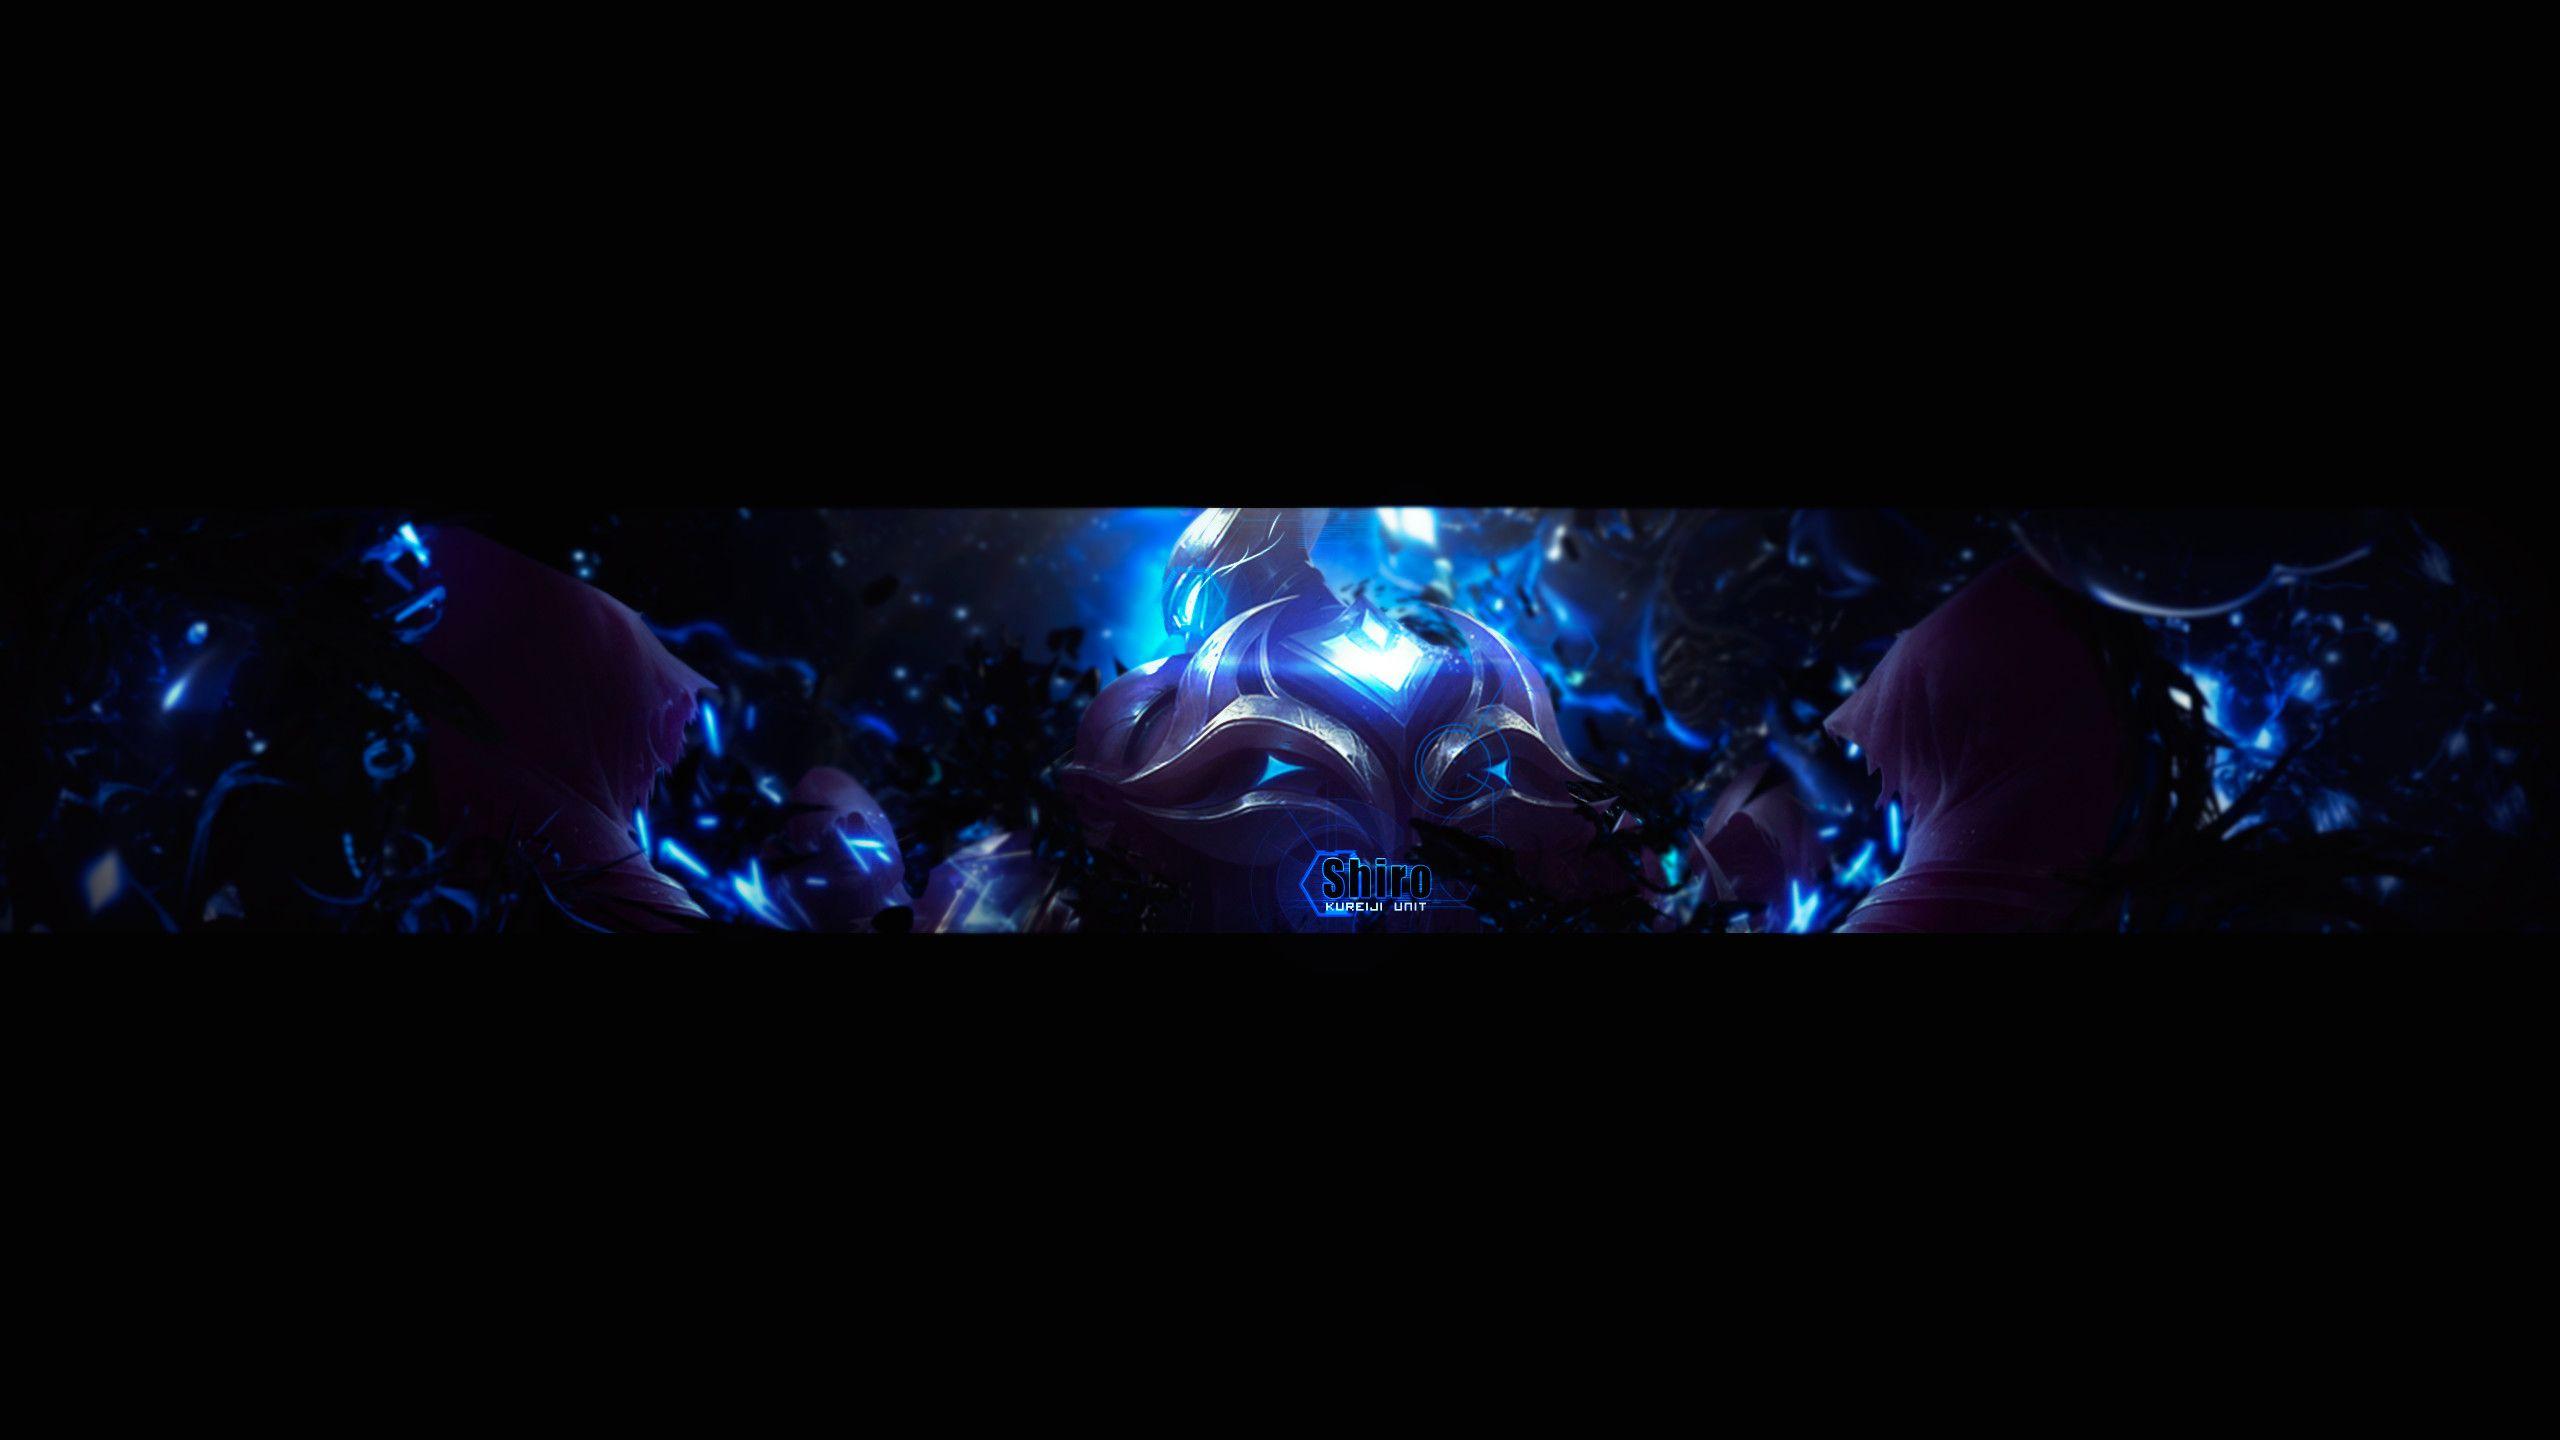 2560x1440 Shiro Youtube Banner By Deykyra Shiro Youtube